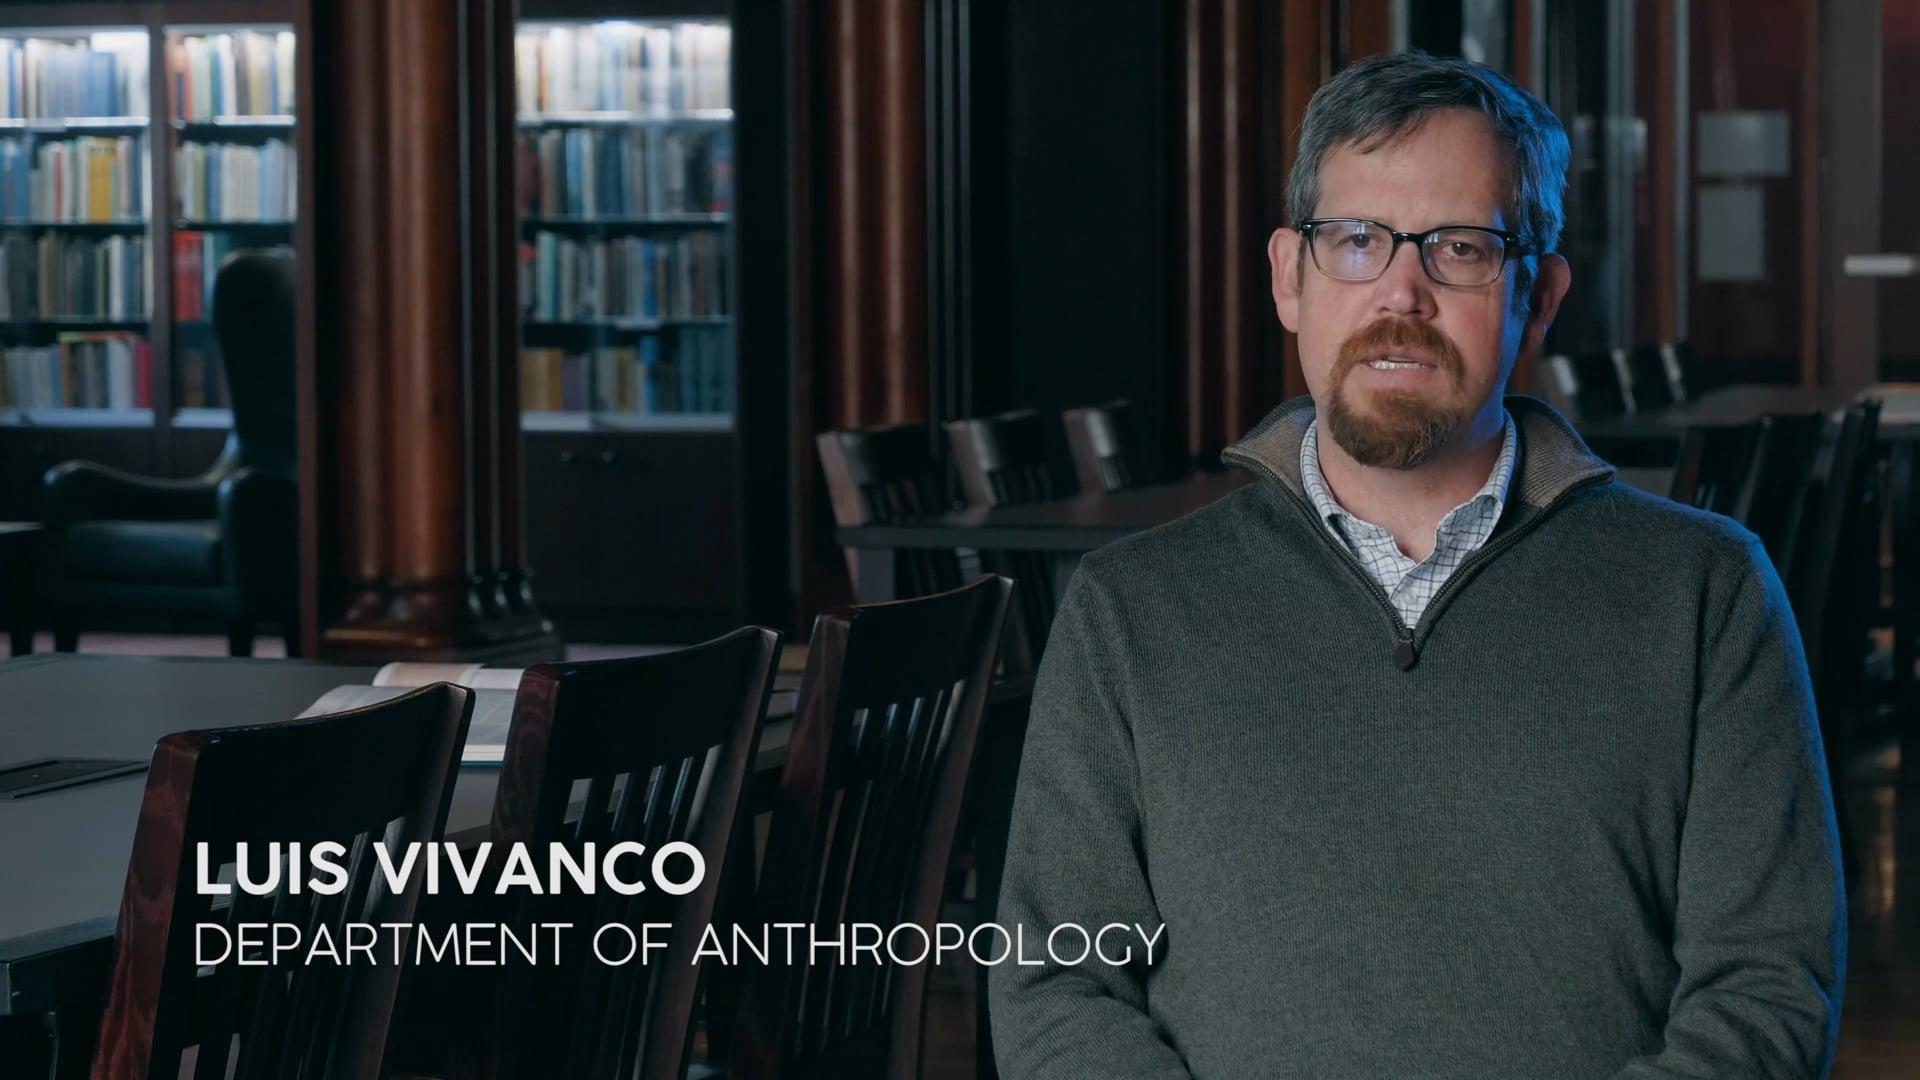 UVM Faculty Profile: Luis Vivanco, Professor of Anthropology